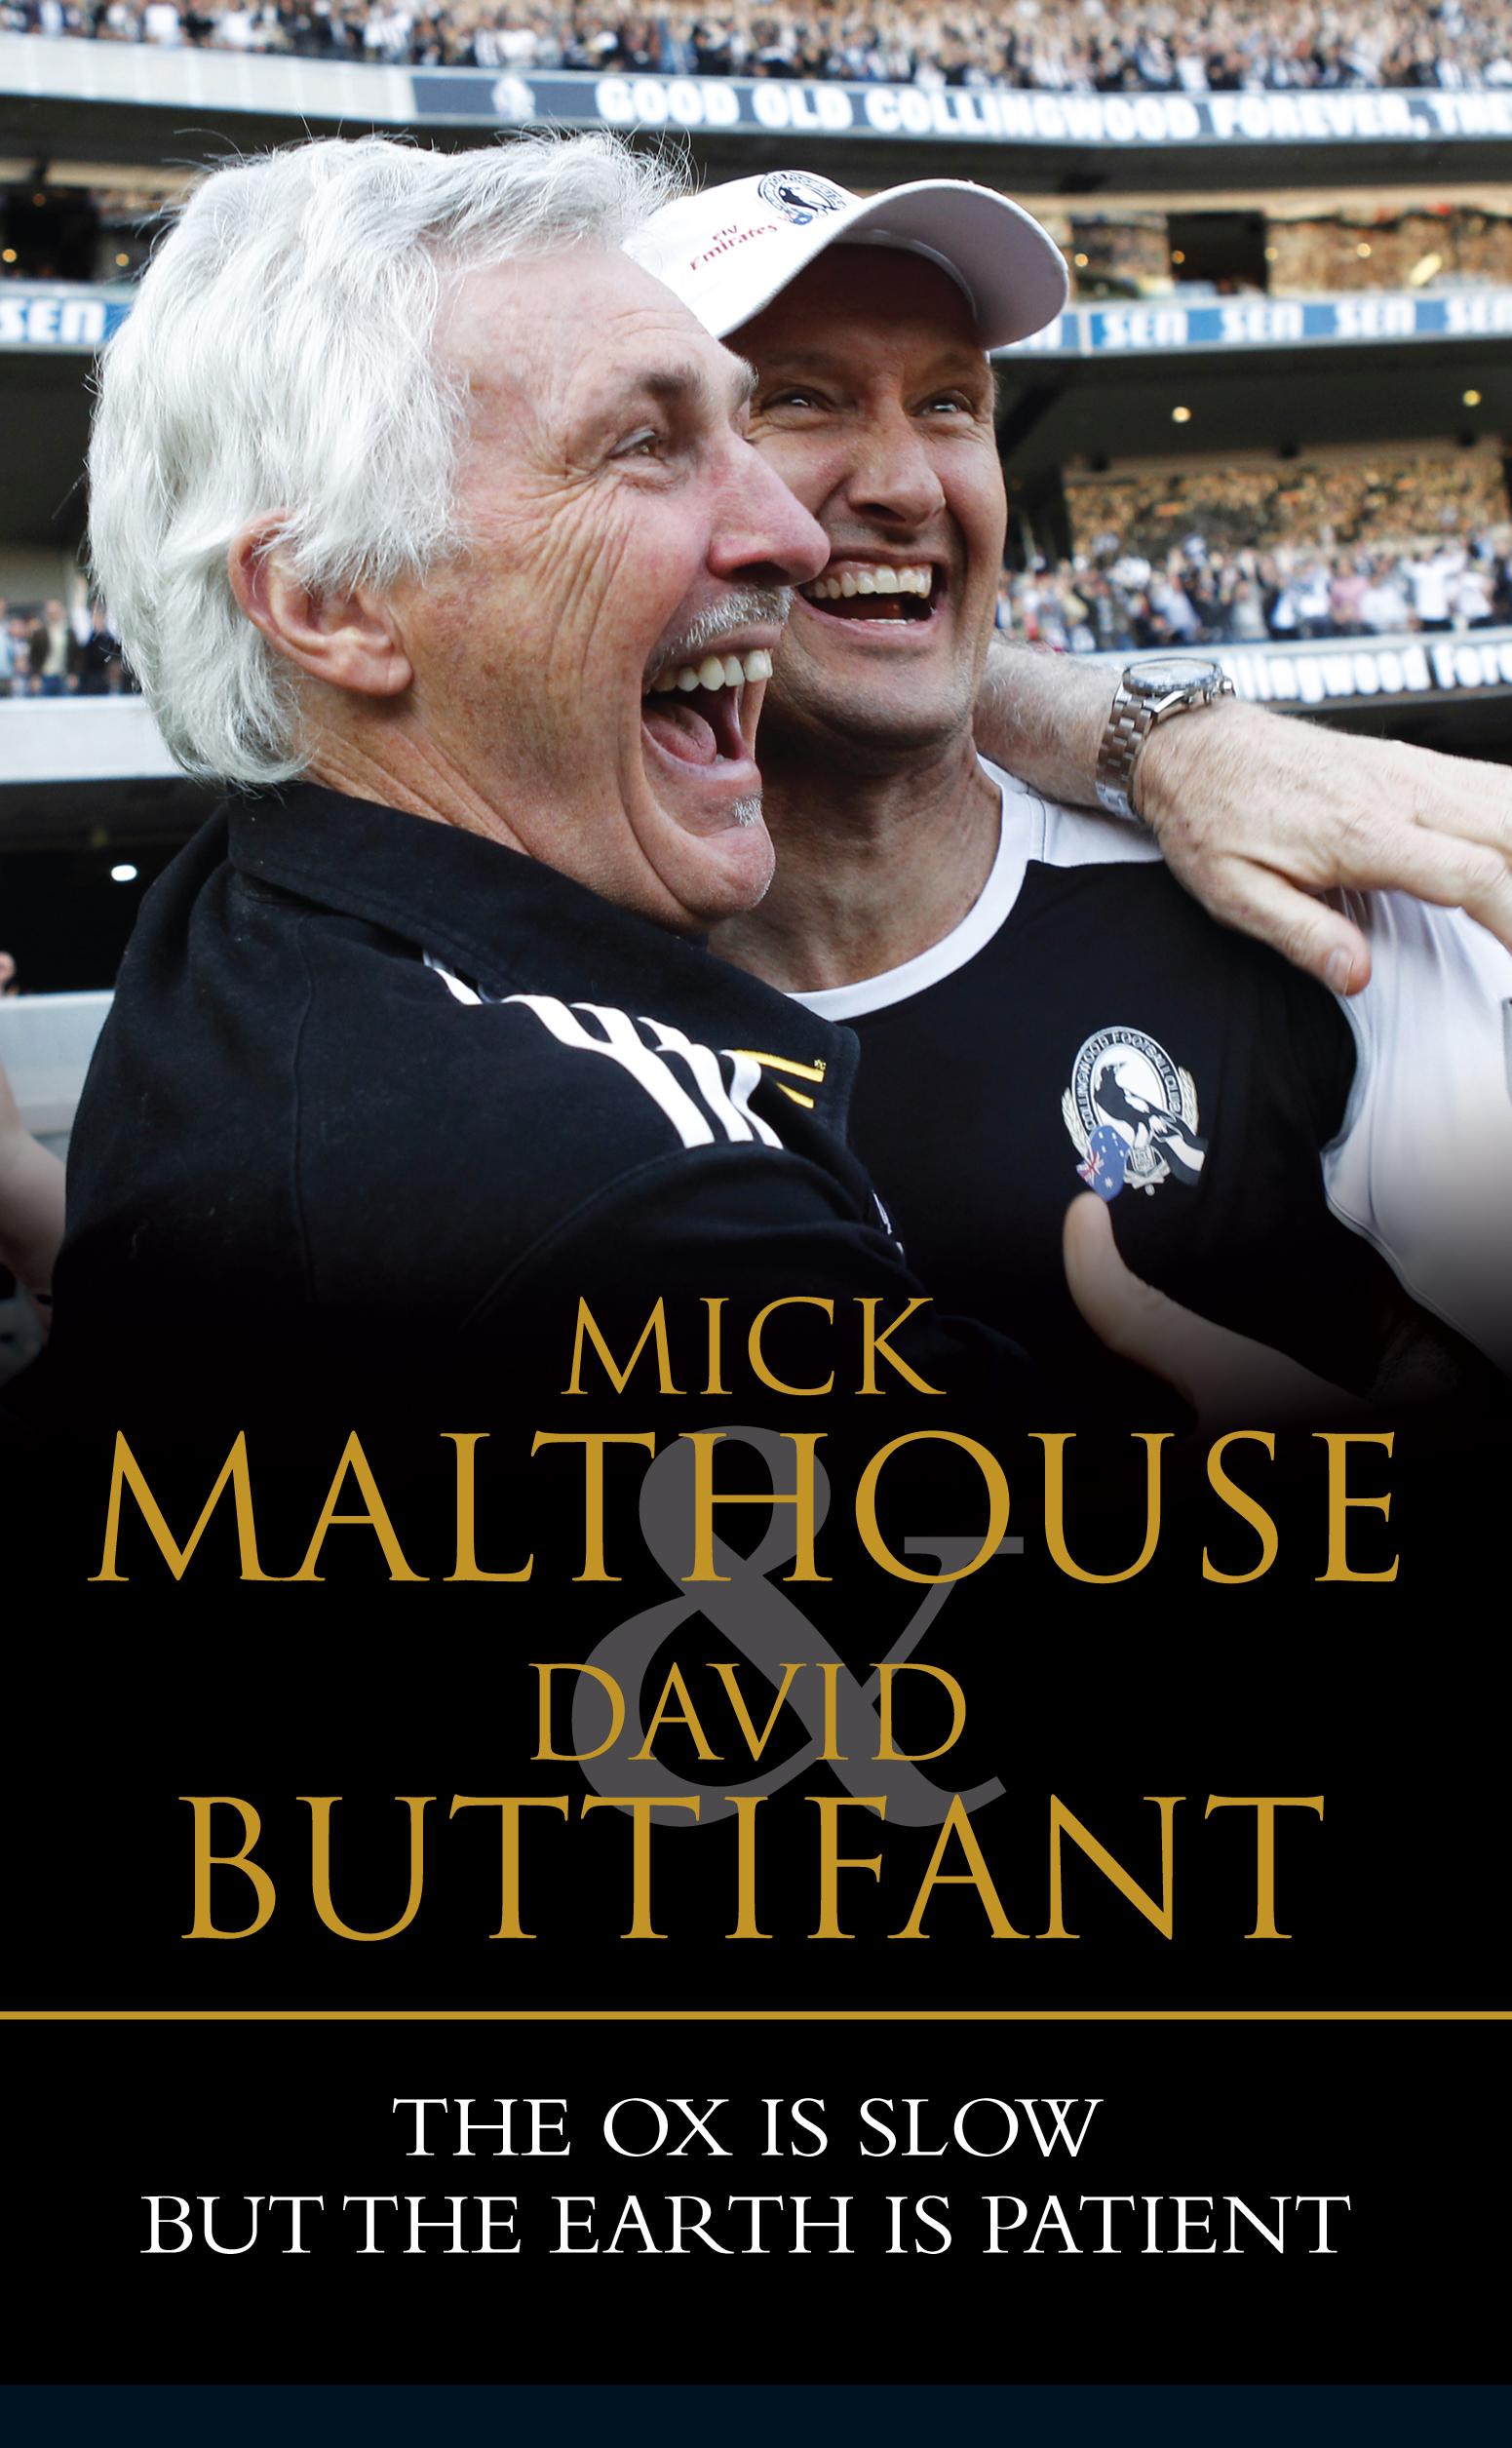 mick malthouse book